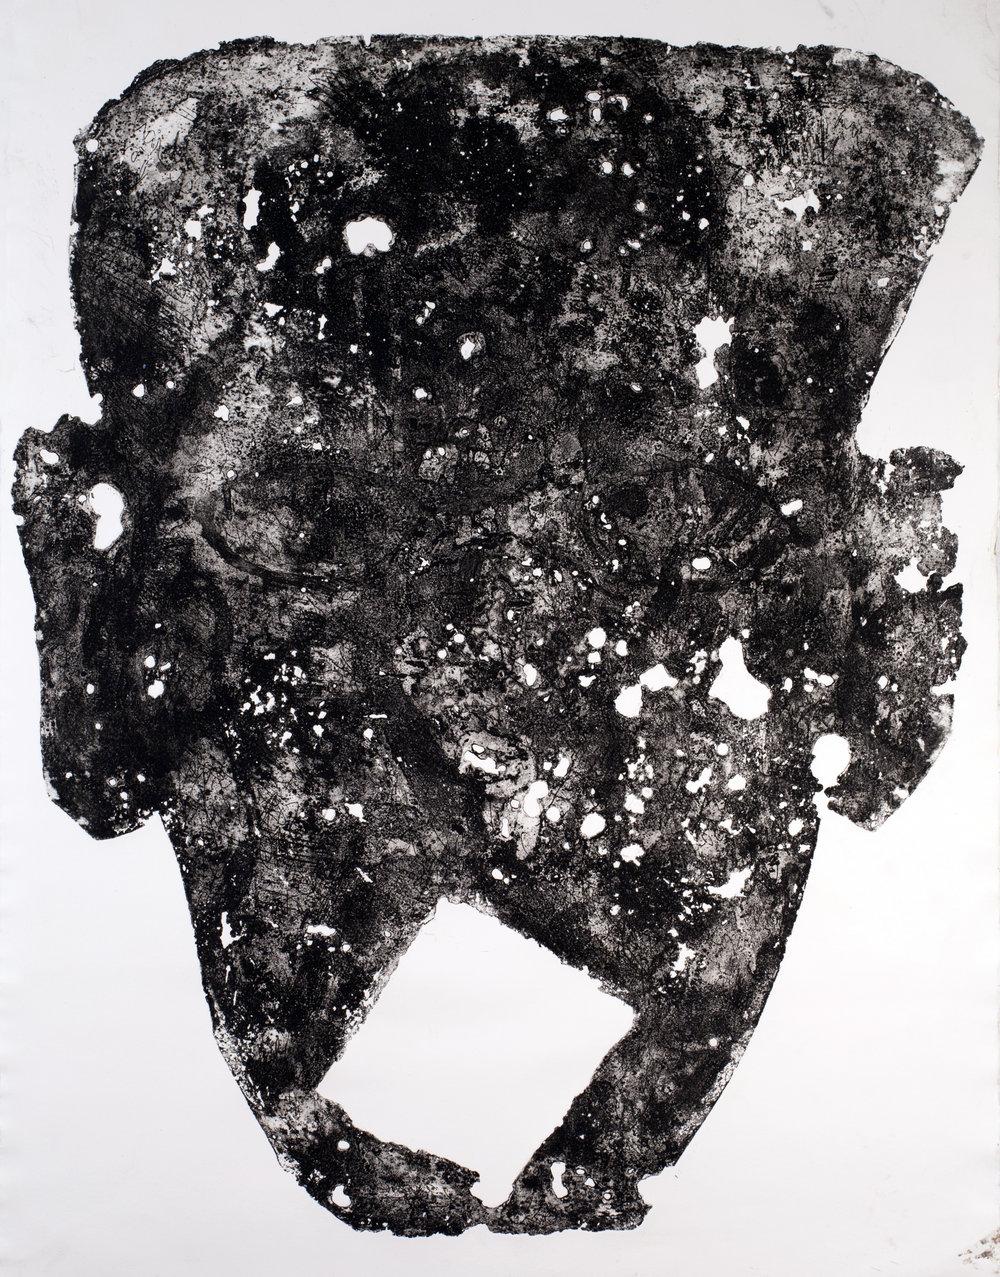 J.S.F. etching portrait series end